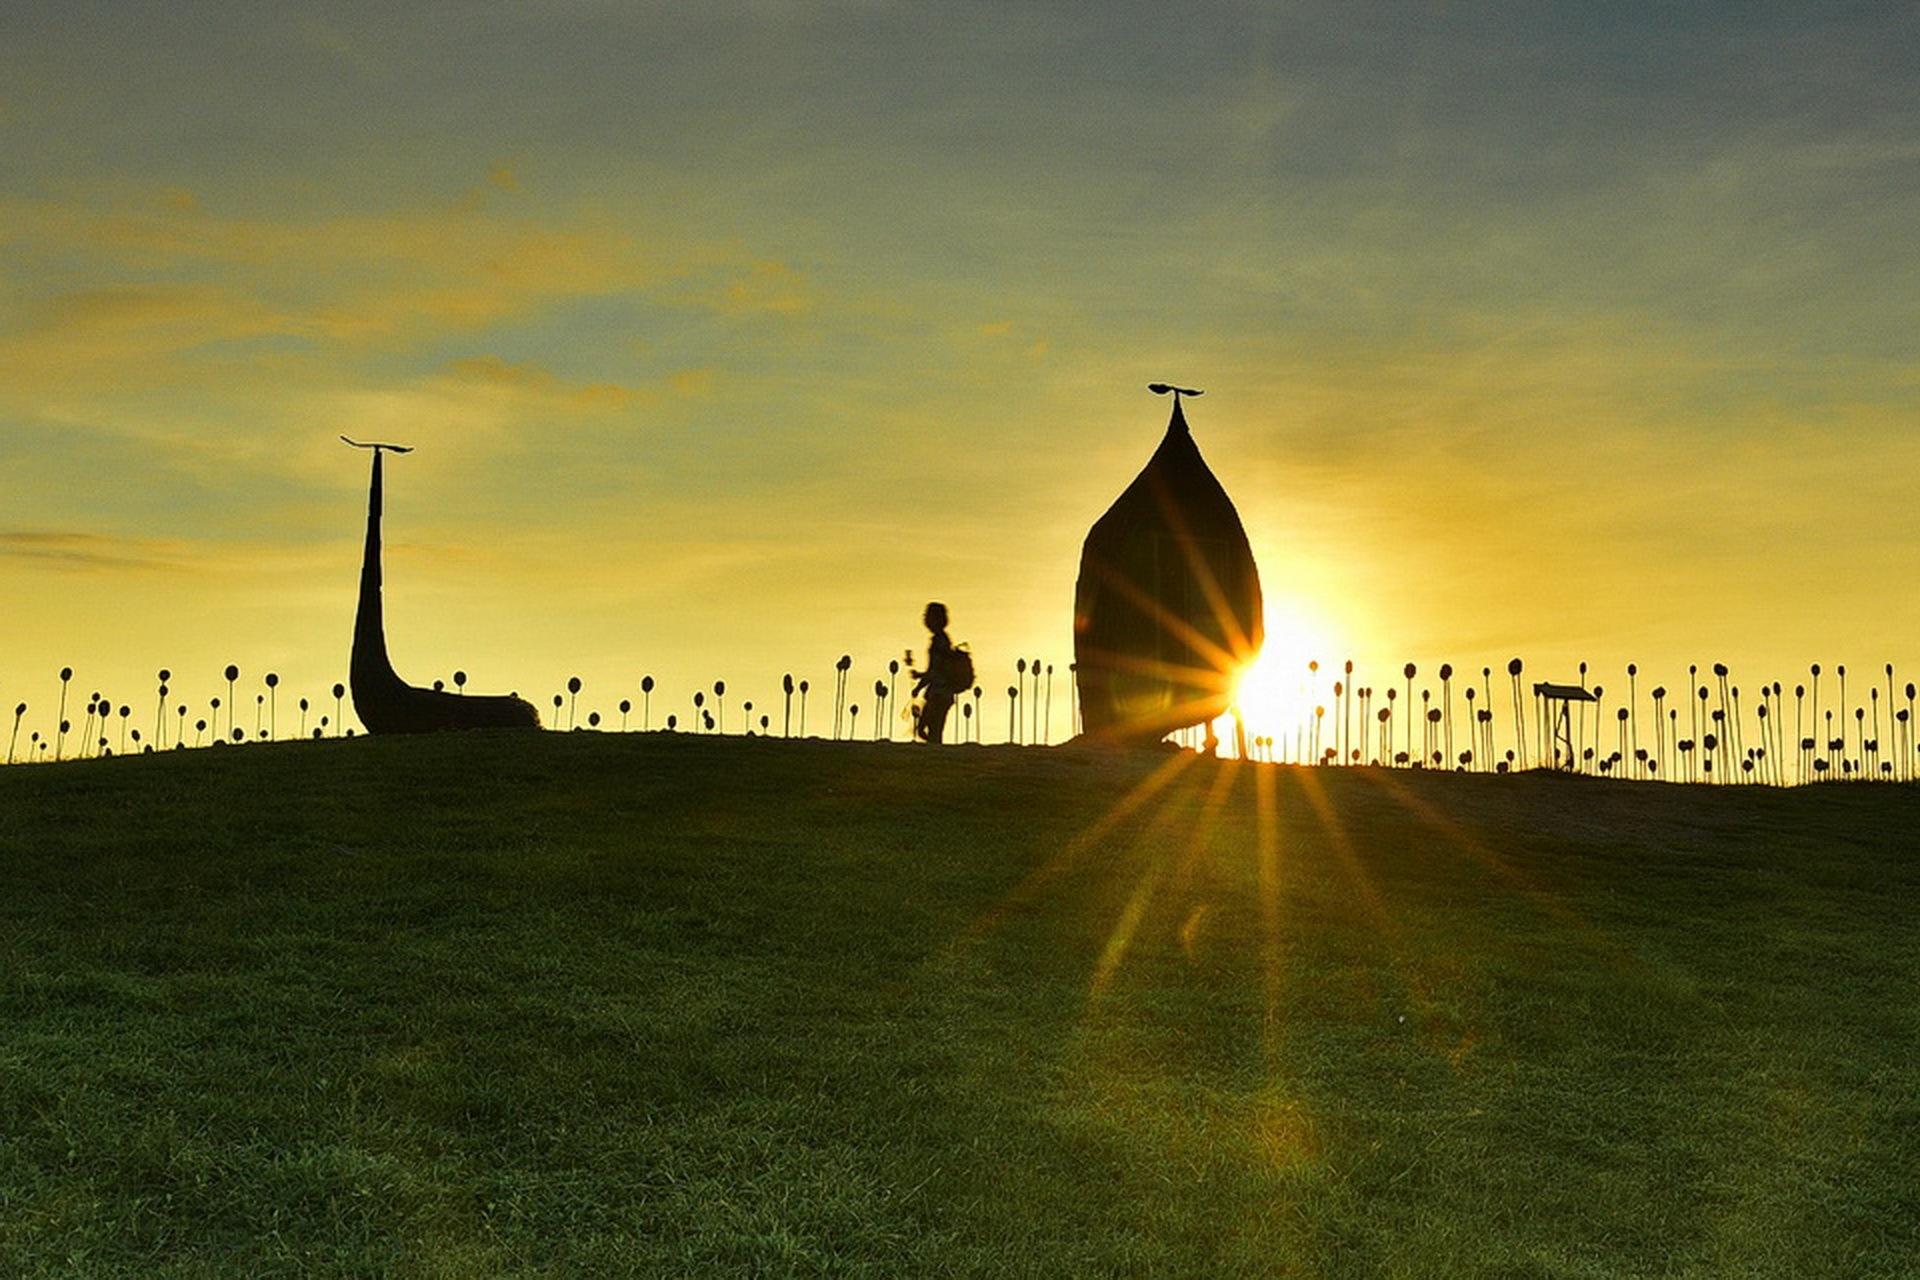 sunrise. by petertyghbn